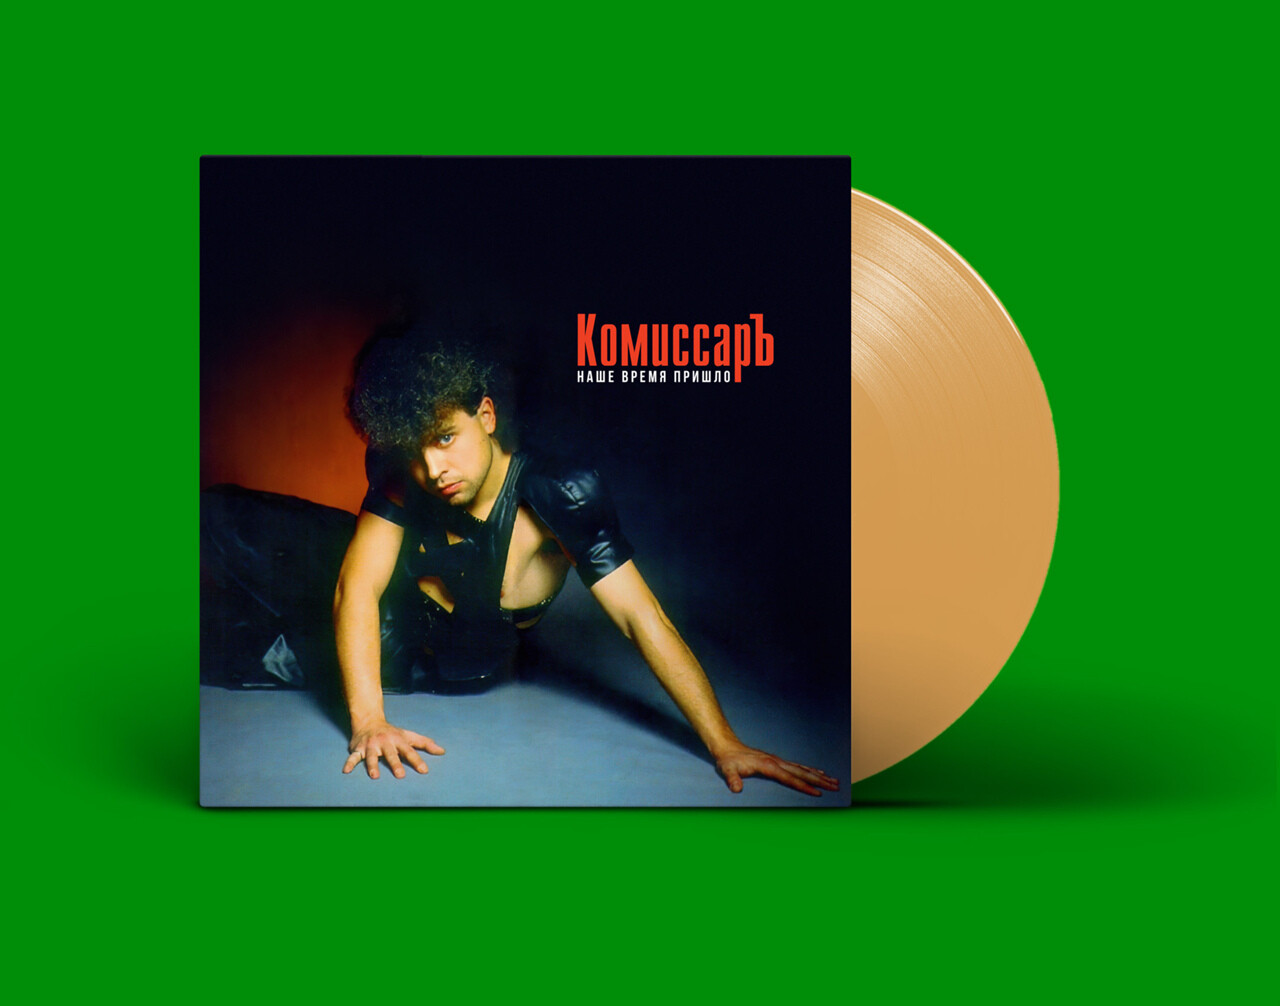 [PREORDER] LP: КомиссарЪ — «Наше время пришло» (1991/2021) [Limited Gold Vinyl]